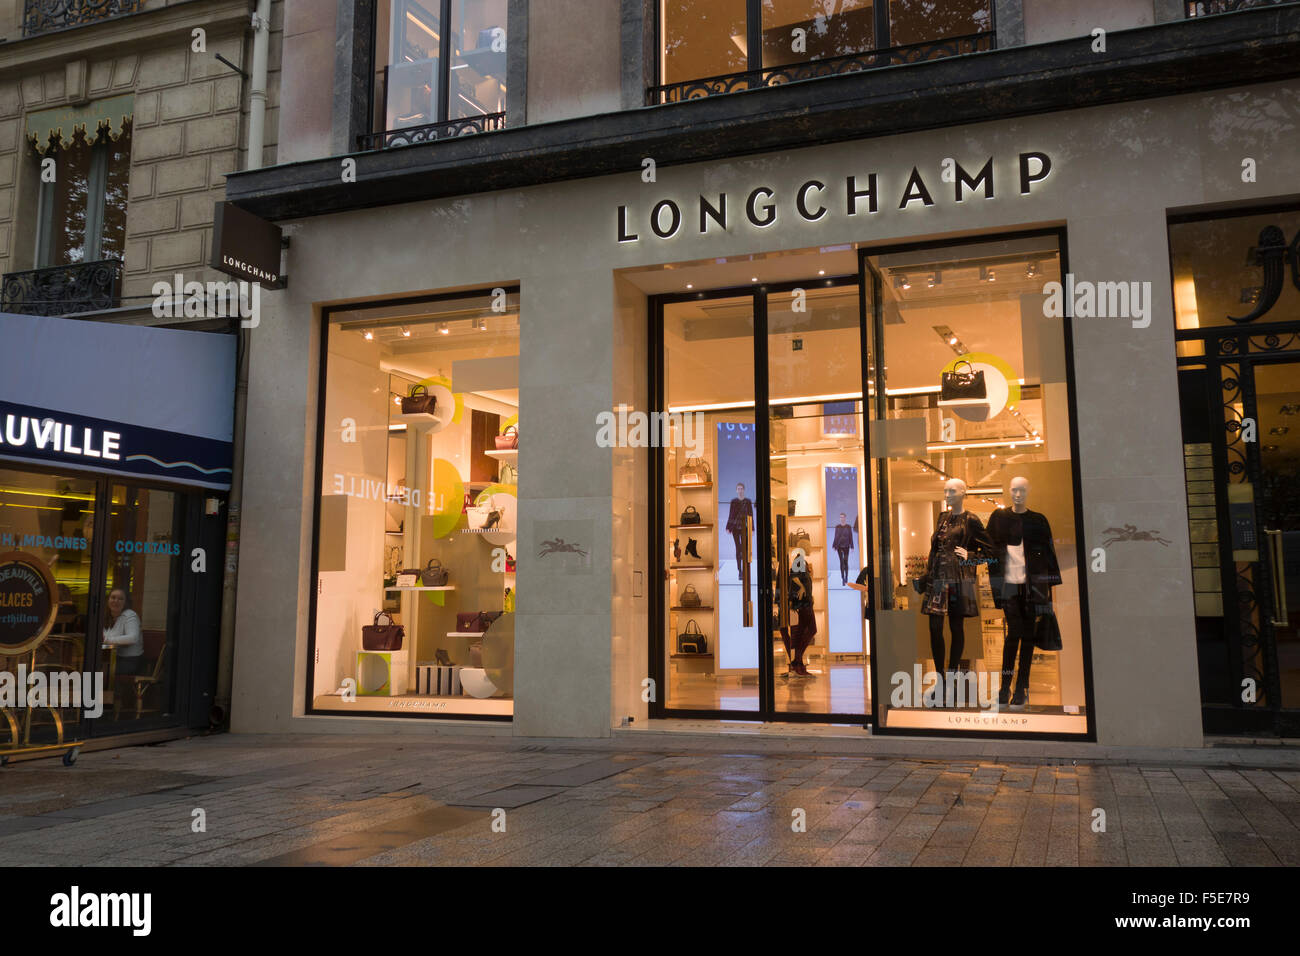 longchamp shop store stock photos longchamp shop store stock images alamy. Black Bedroom Furniture Sets. Home Design Ideas